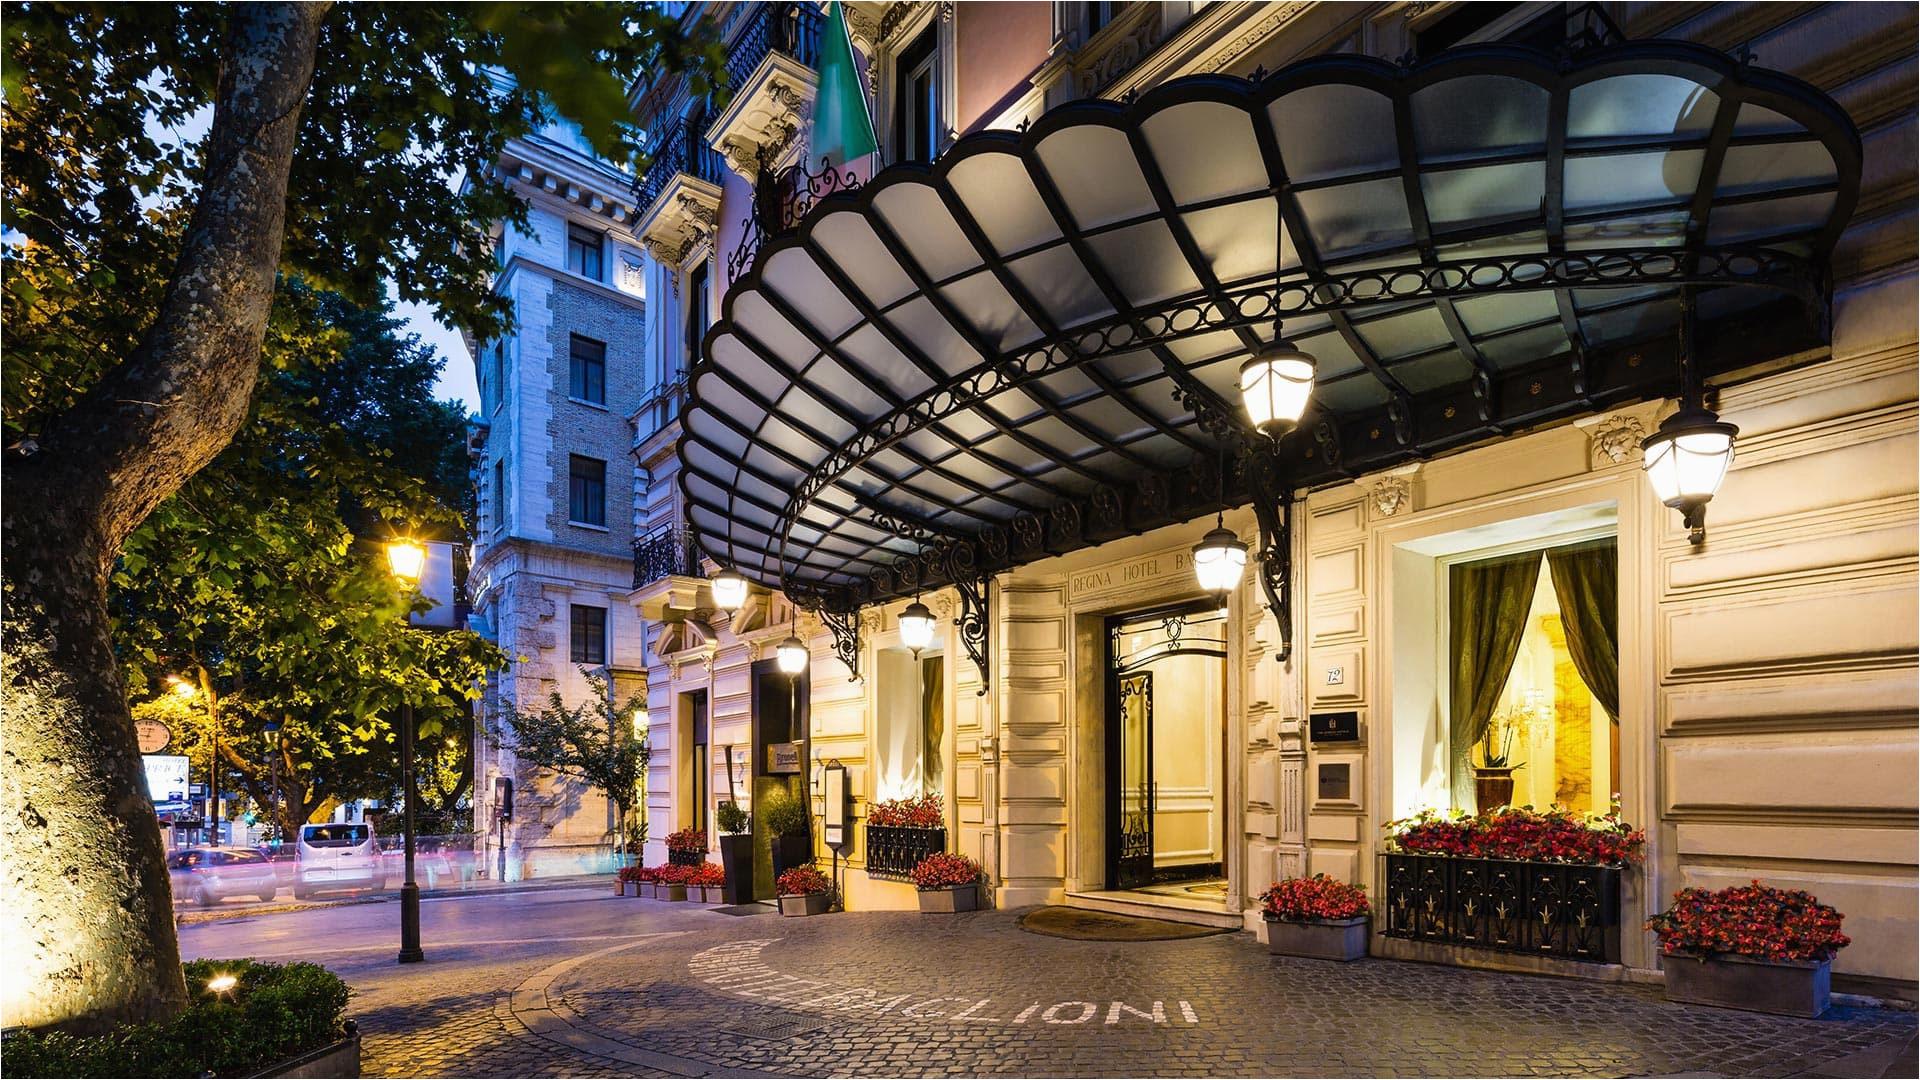 baglioni hotel regina 5 star italian luxury accommodation